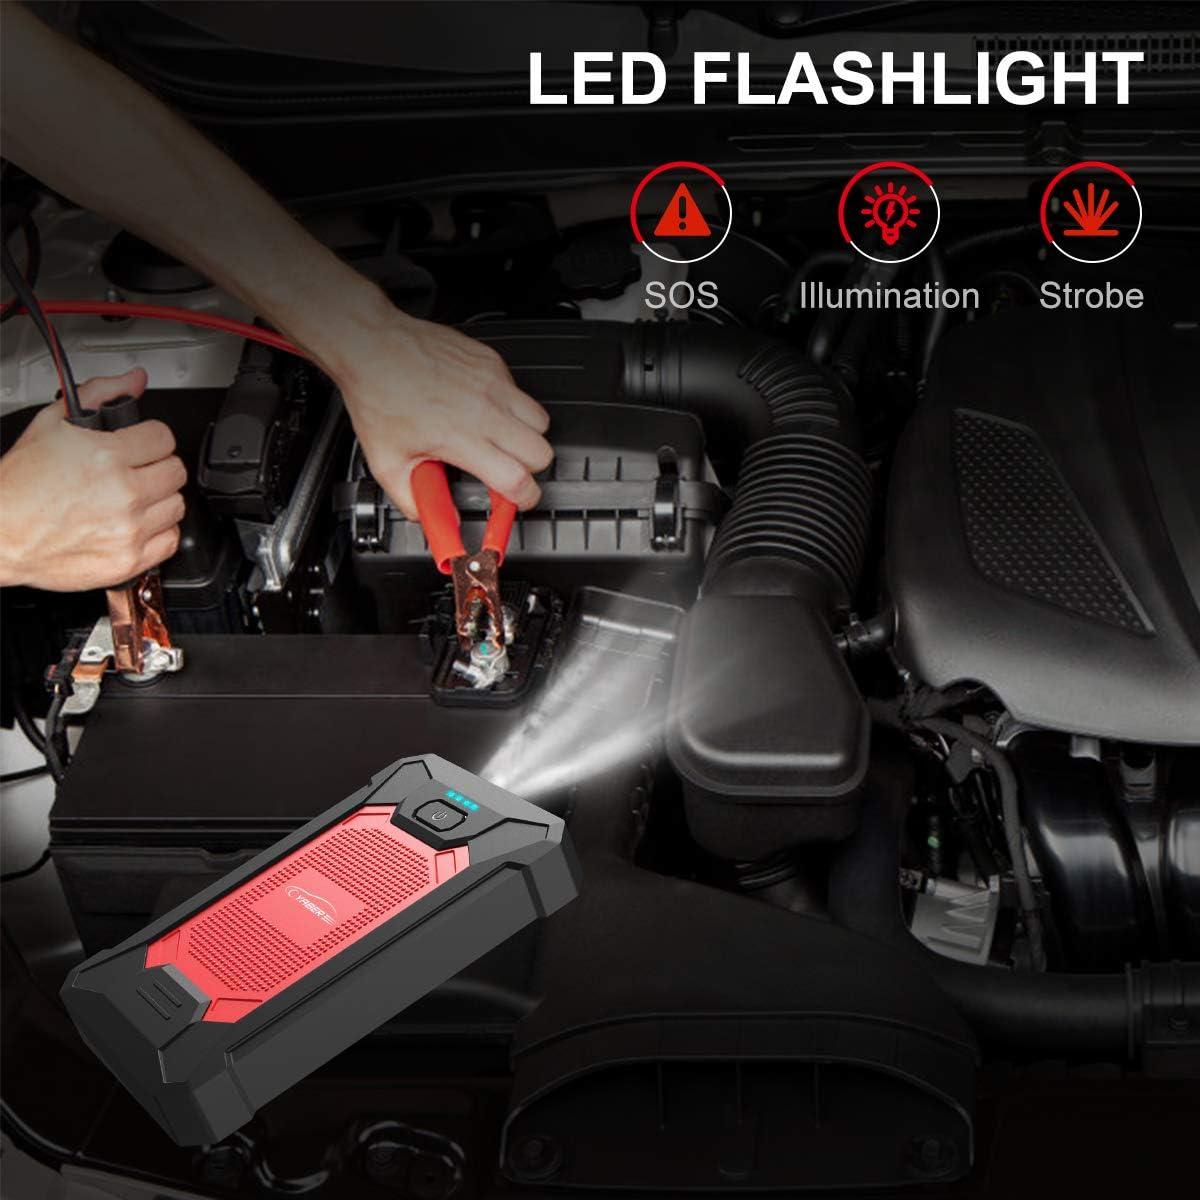 Booster Batterie 12000mah IP66 Auto Voiture Outils Garage Démarrage voiture